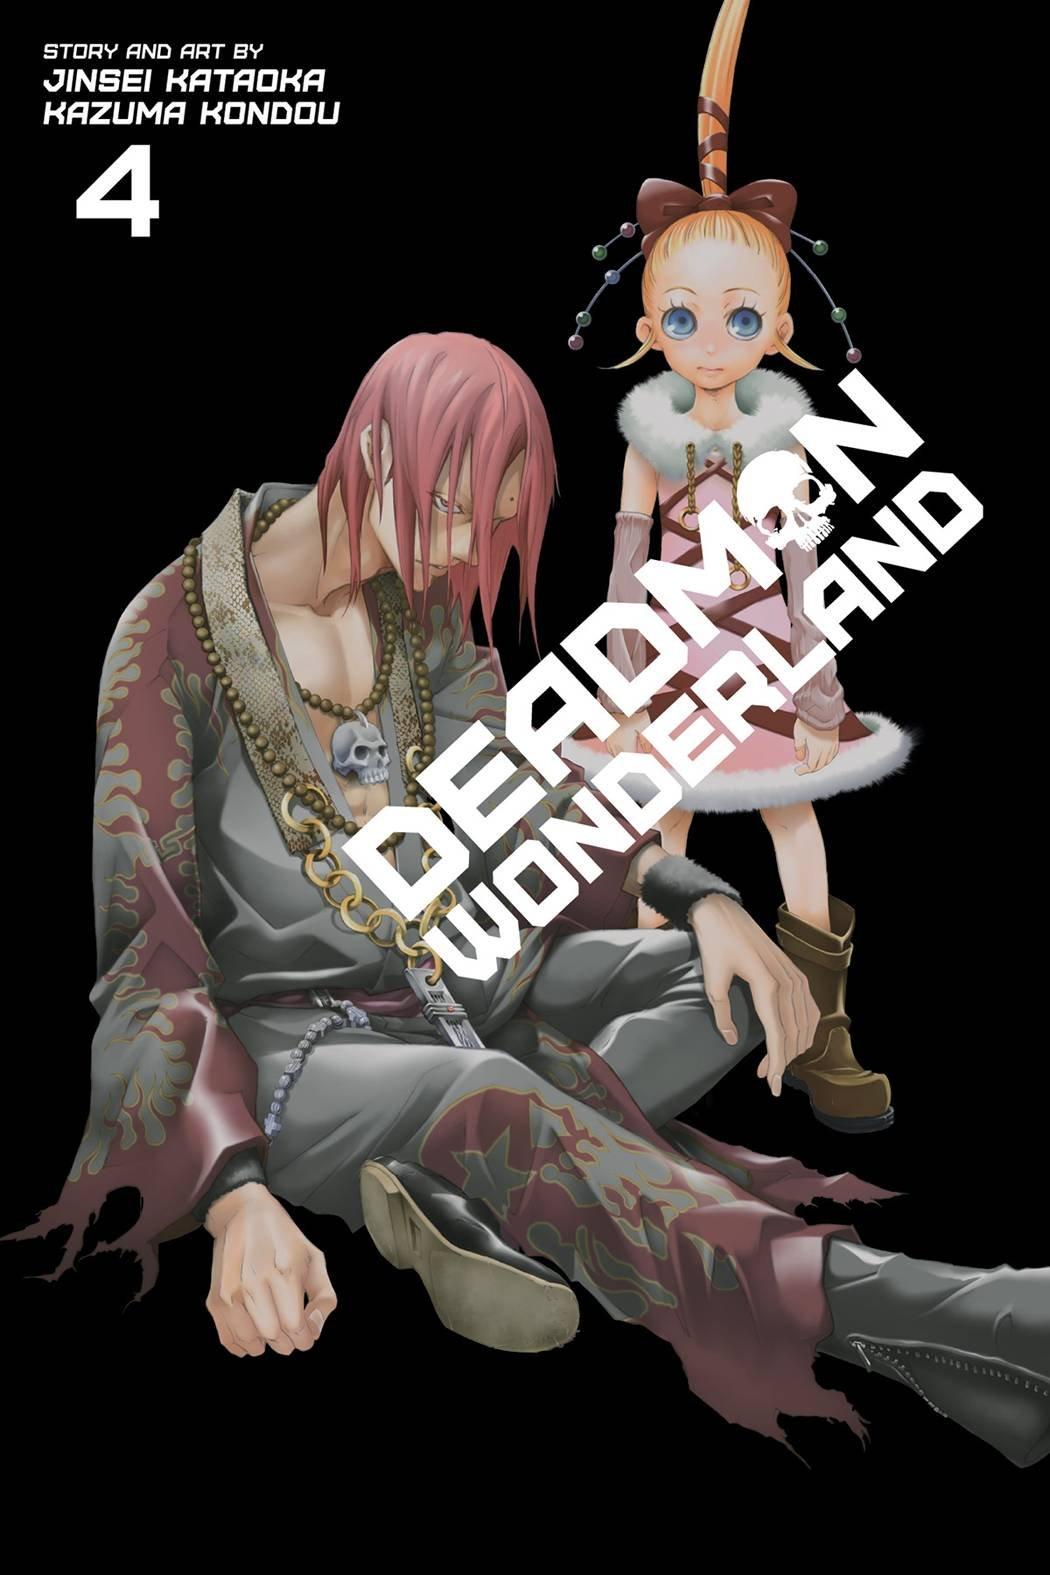 Amazon deadman wonderland vol 4 9781421564128 jinsei amazon deadman wonderland vol 4 9781421564128 jinsei kataoka kazuma kondou books voltagebd Gallery